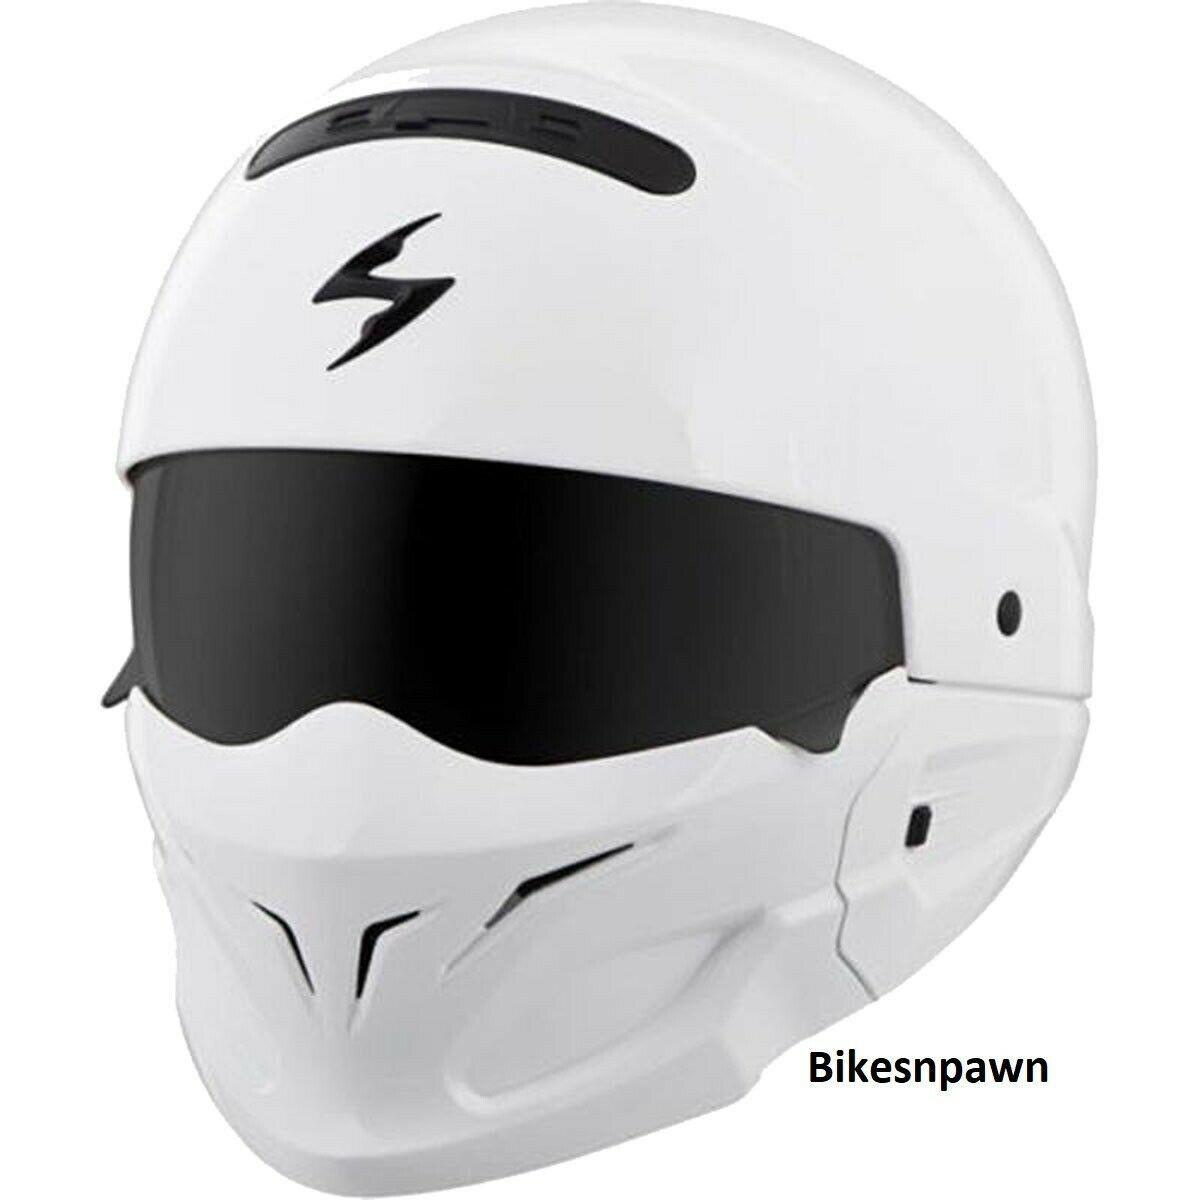 New Size XS Scorpion EXO Covert White 3 in 1 Motorcycle Helmet DOT